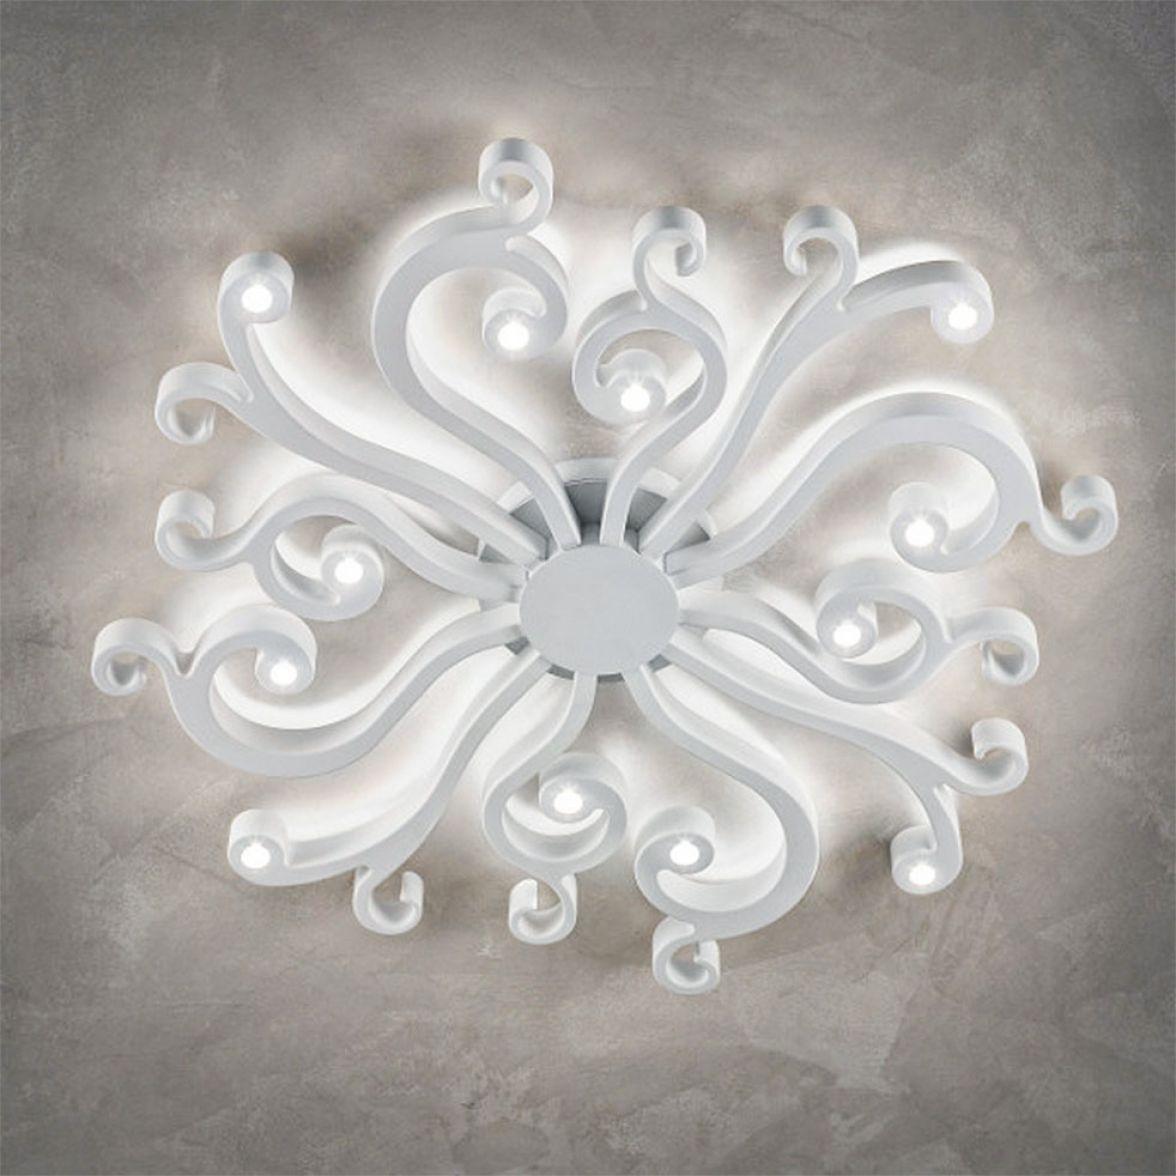 Virgo lamp